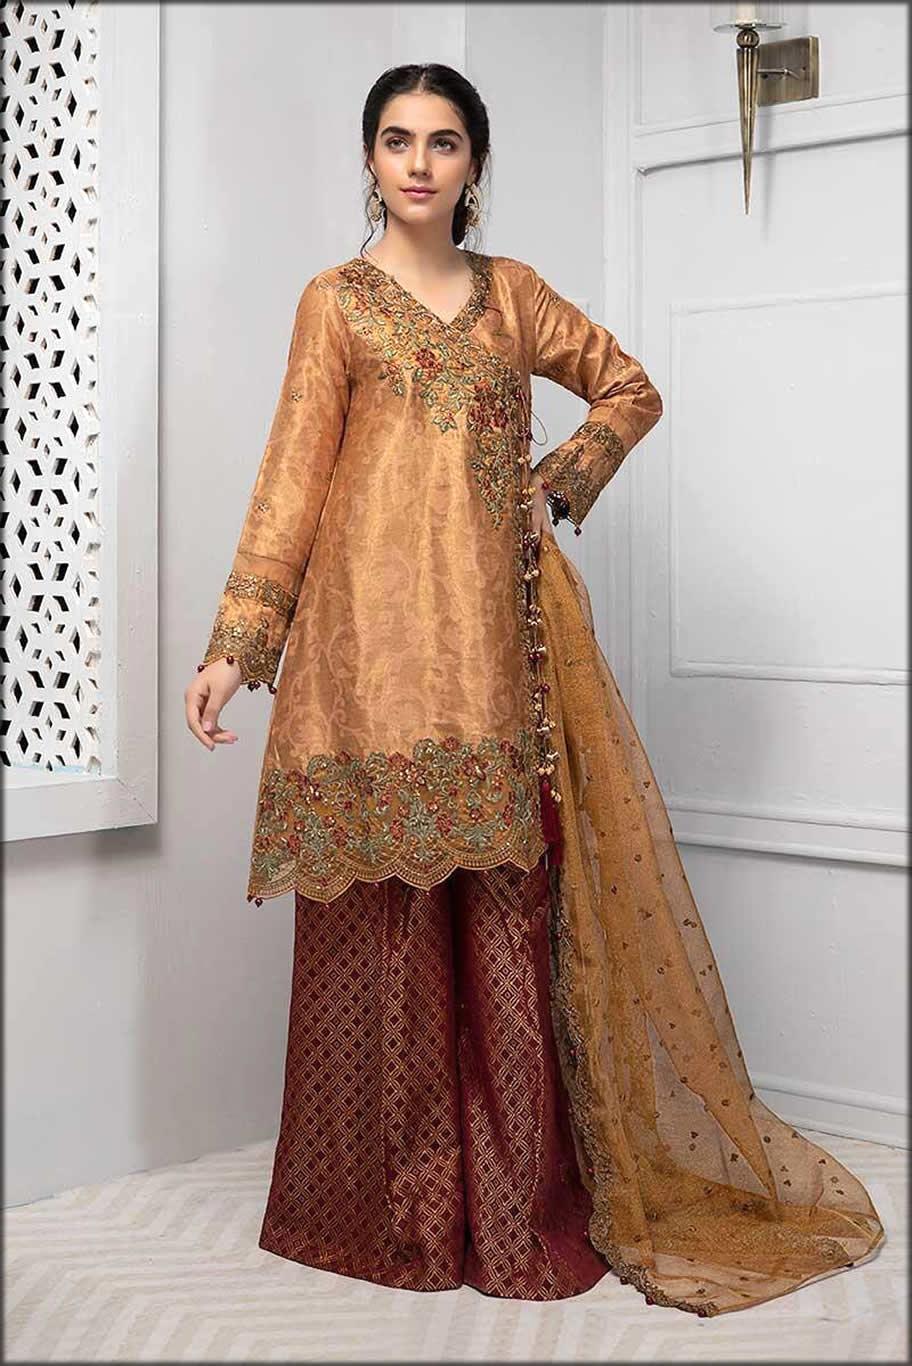 Maria B Stunning Angrakha Suit